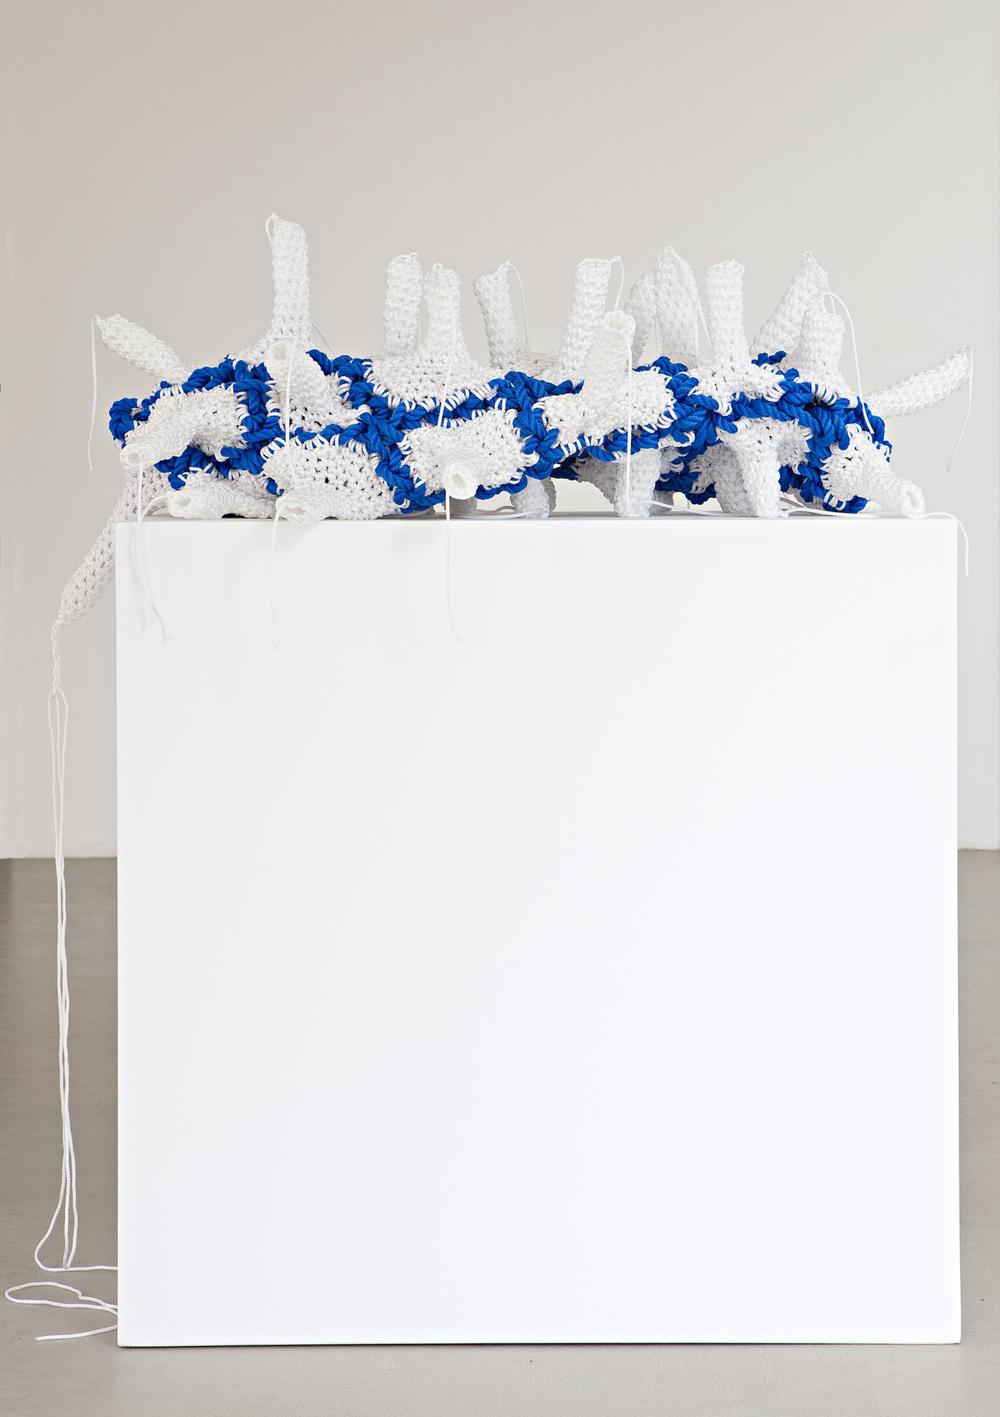 Fabrik   2012  Polypropylene, pedestal  Object: 34 x 126 x 54 cm / 13.4 x 49.6 x 21.3 in